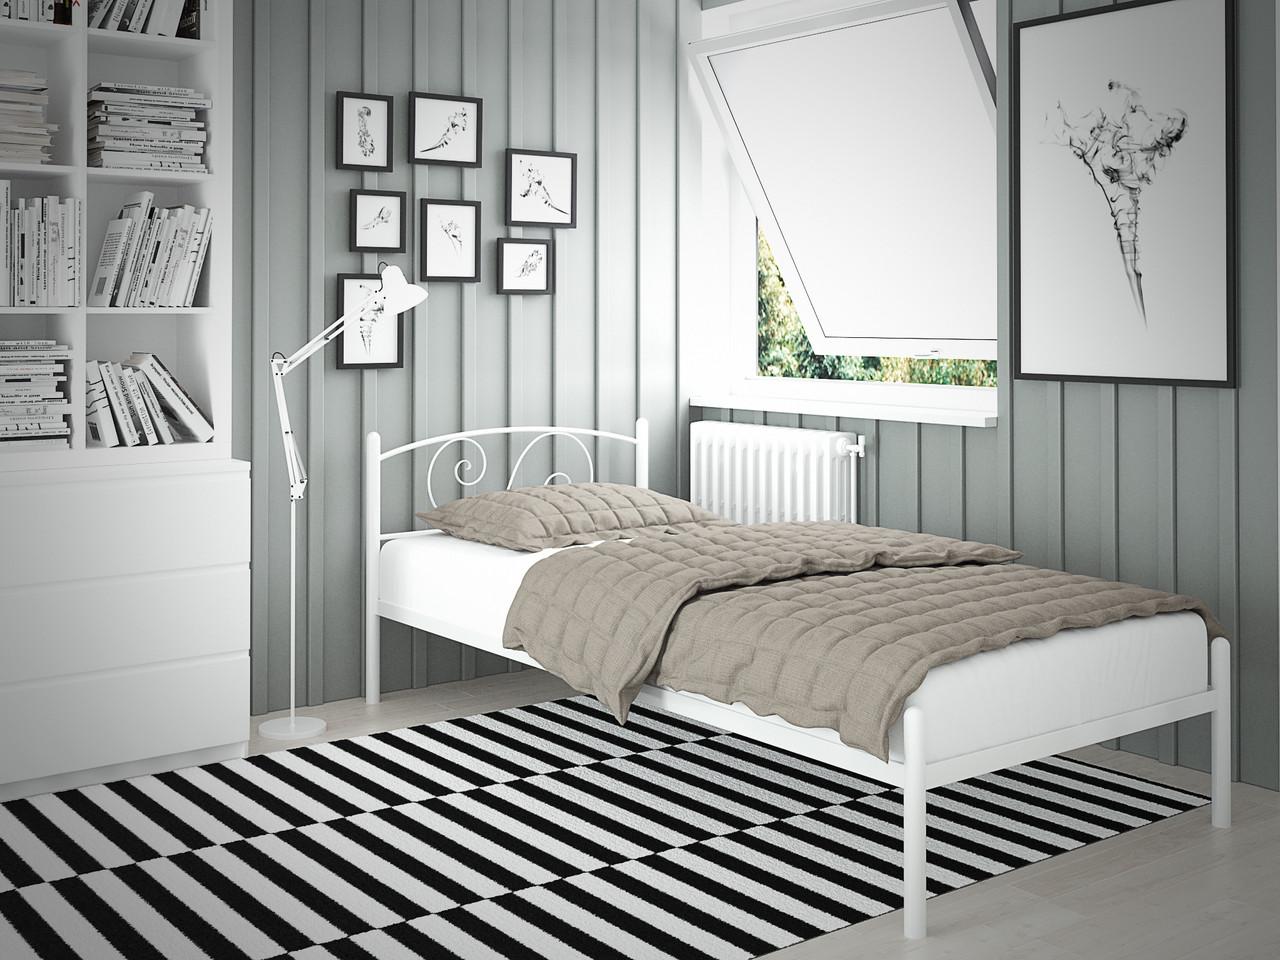 Кровать Виола Мини Белая 80*190 (Tenero TM)